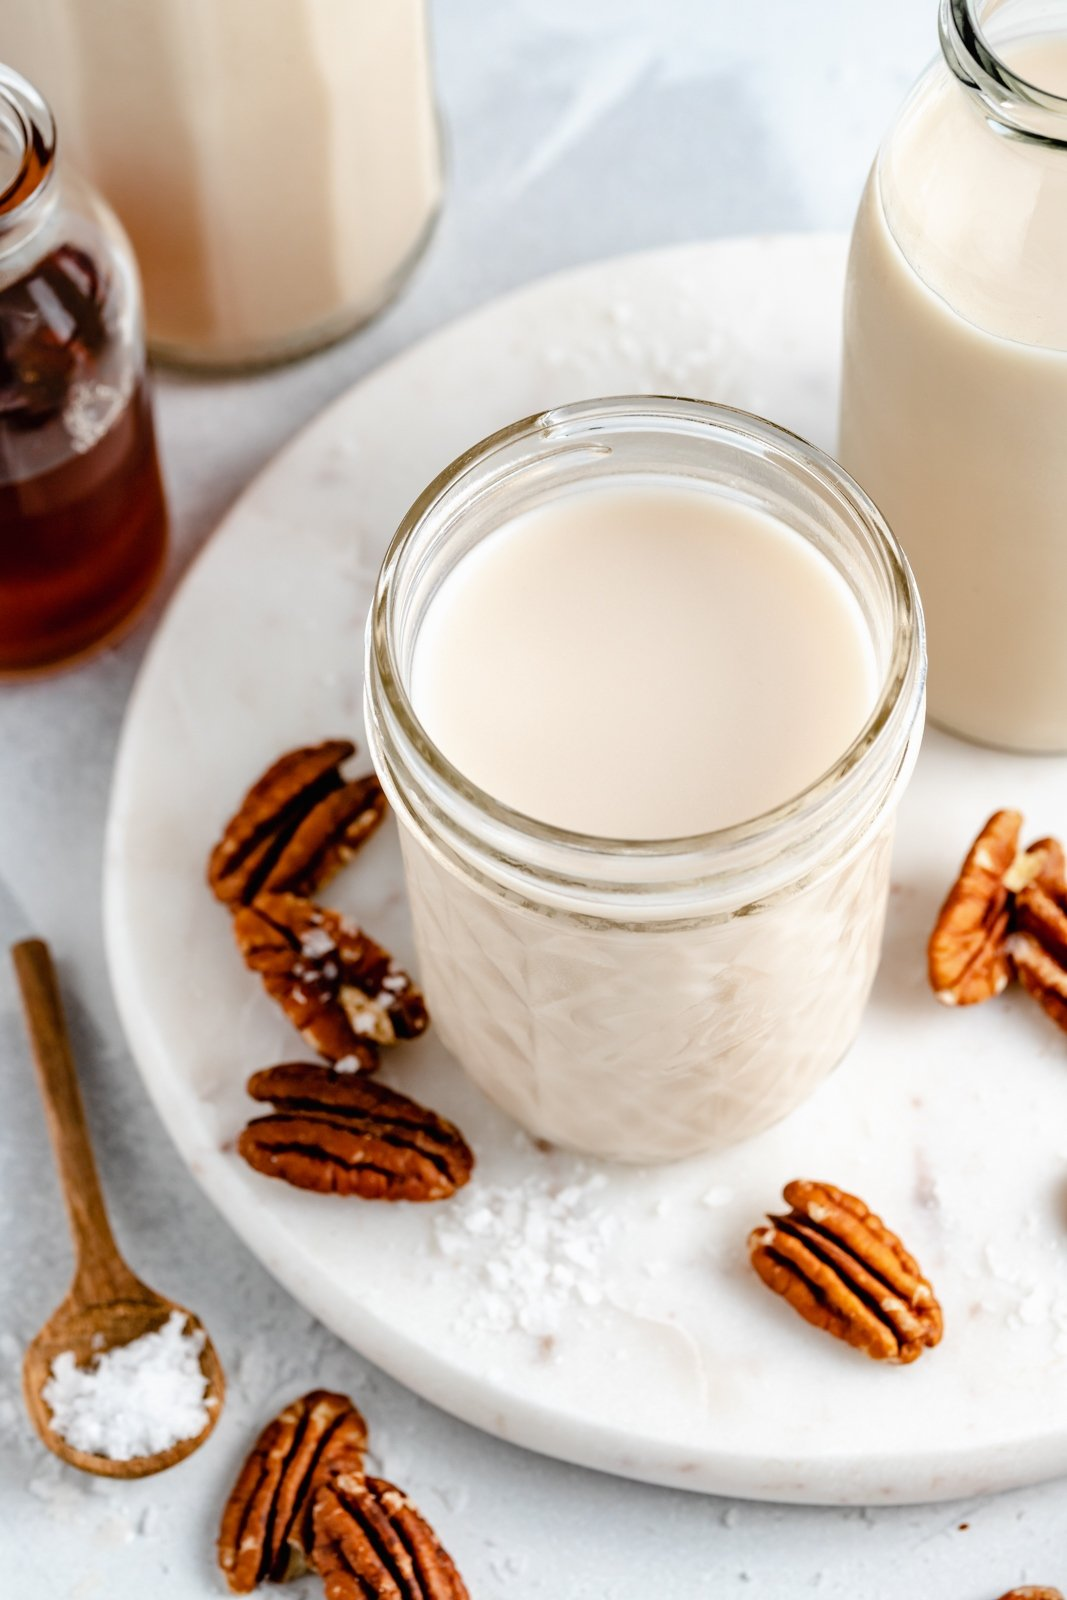 homemade pecan milk in a glass